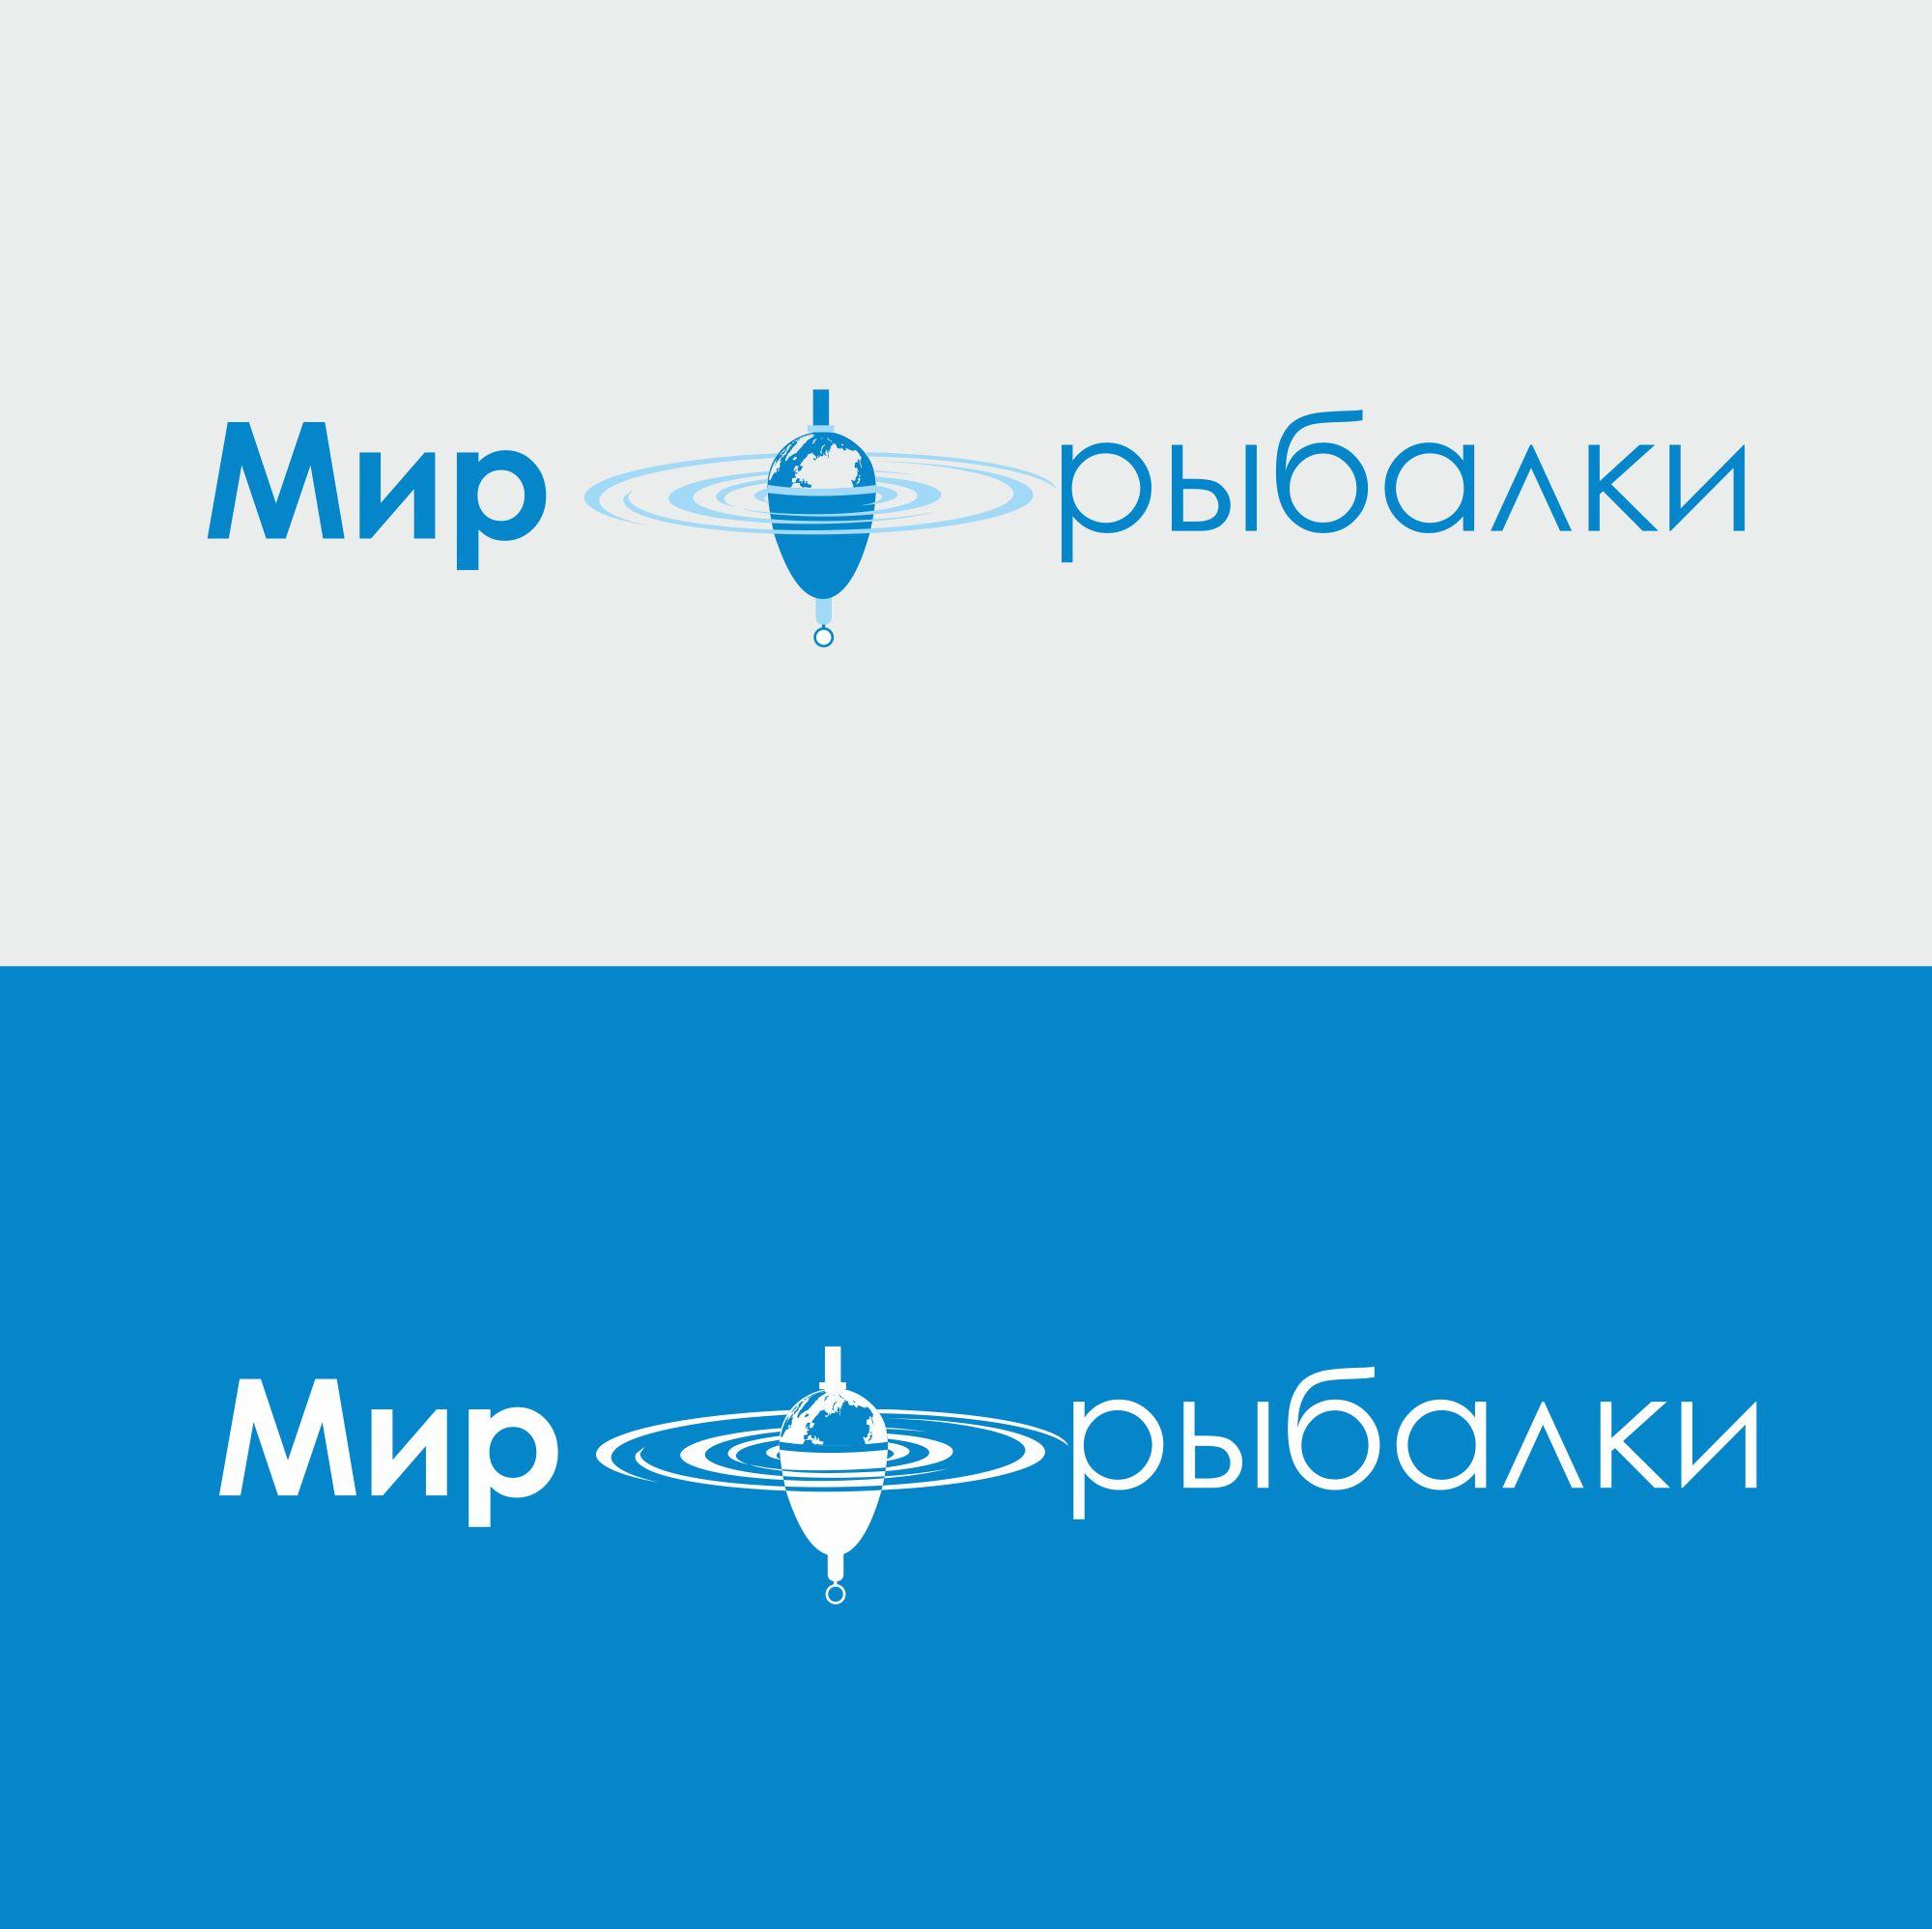 Логотип рыболовного магазина - дизайнер markosov